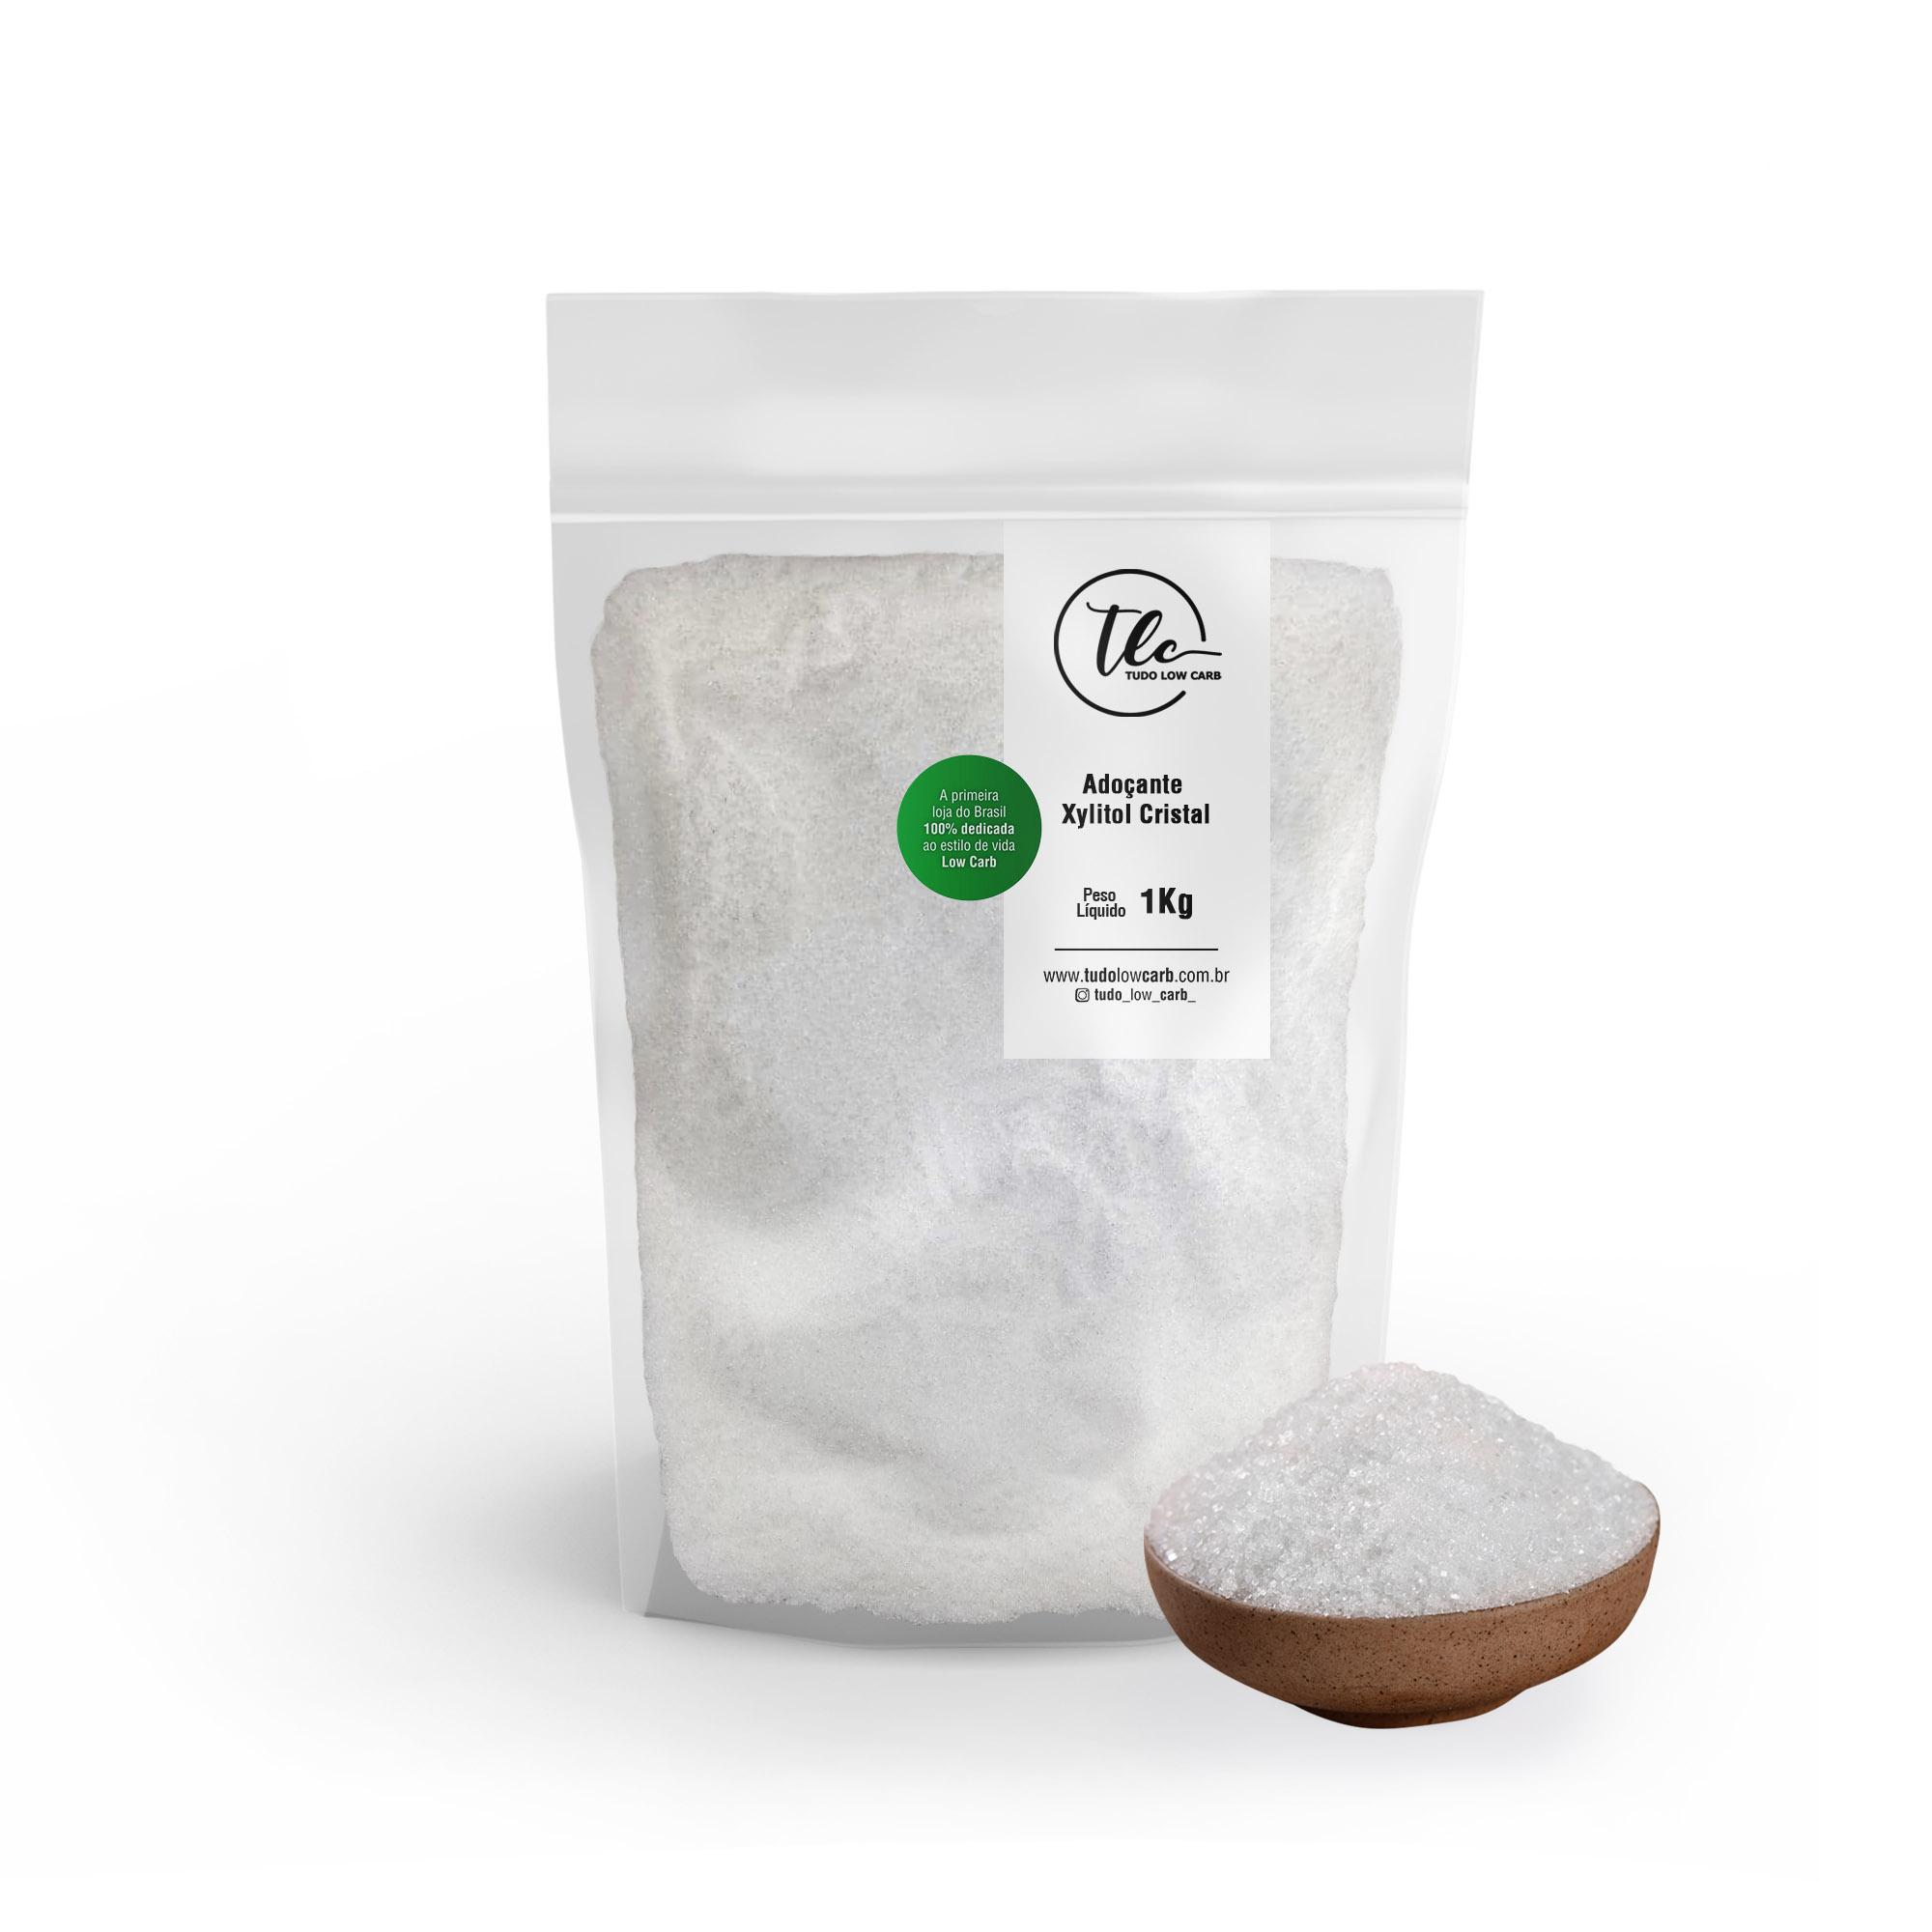 Adoçante Xylitol (Xilitol) Cristal 1 kg  - TLC Tudo Low Carb